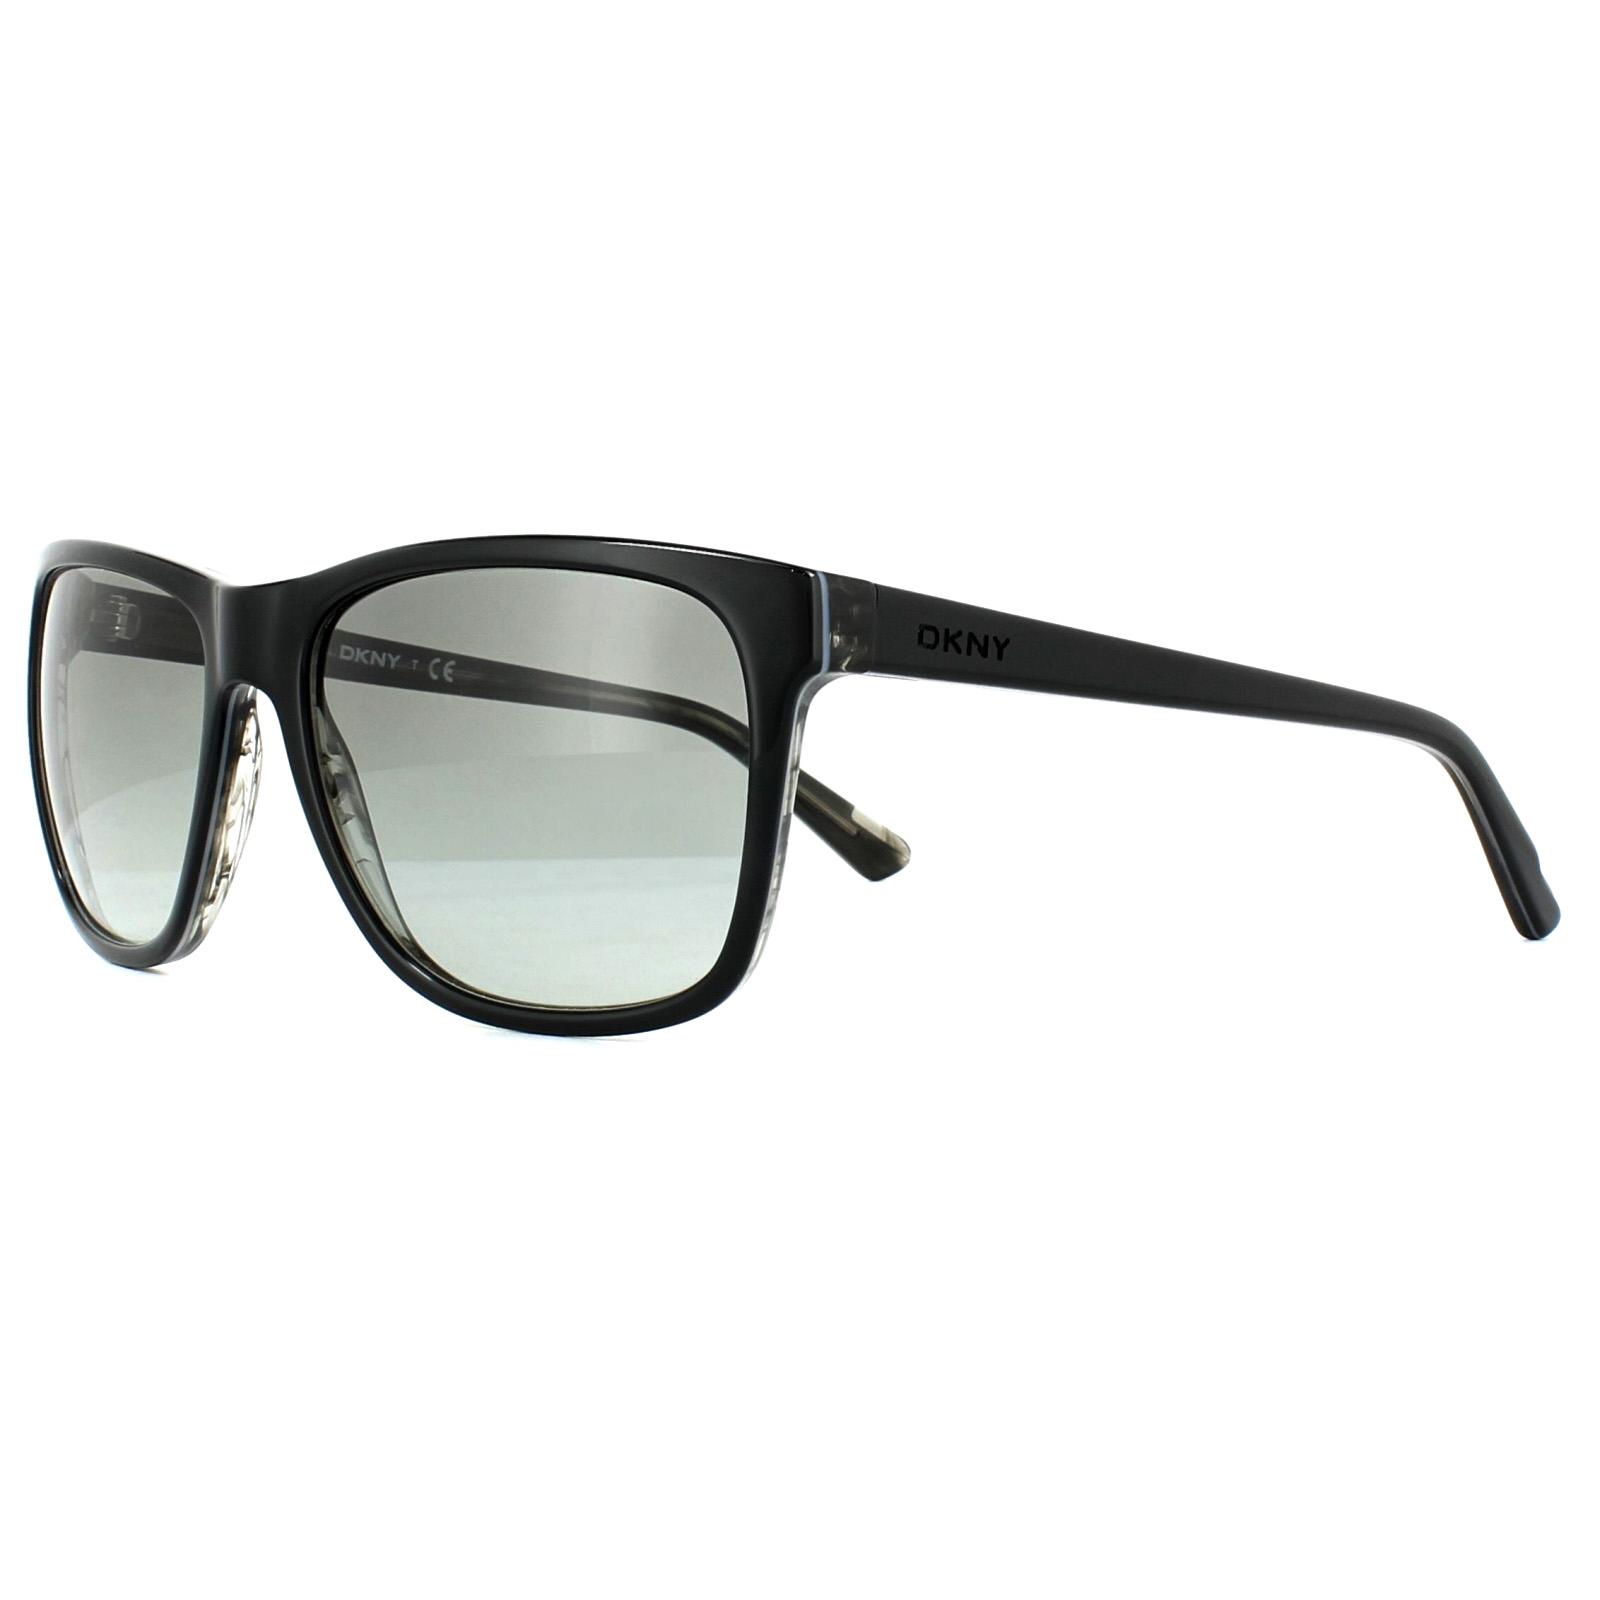 ce577cd9cf6b Cheap DKNY 4131 Sunglasses - Discounted Sunglasses